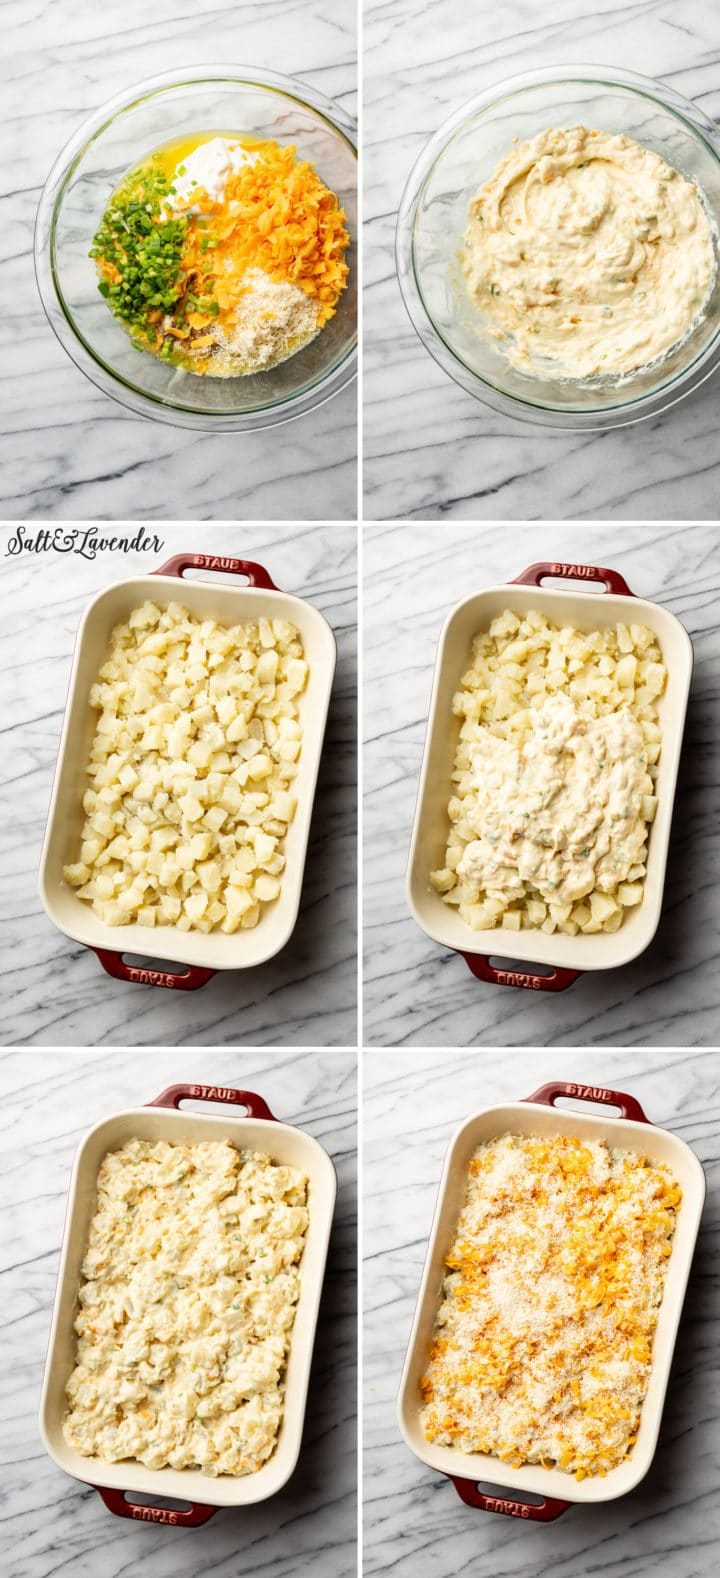 how to make cheesy potato casserole process photo collage